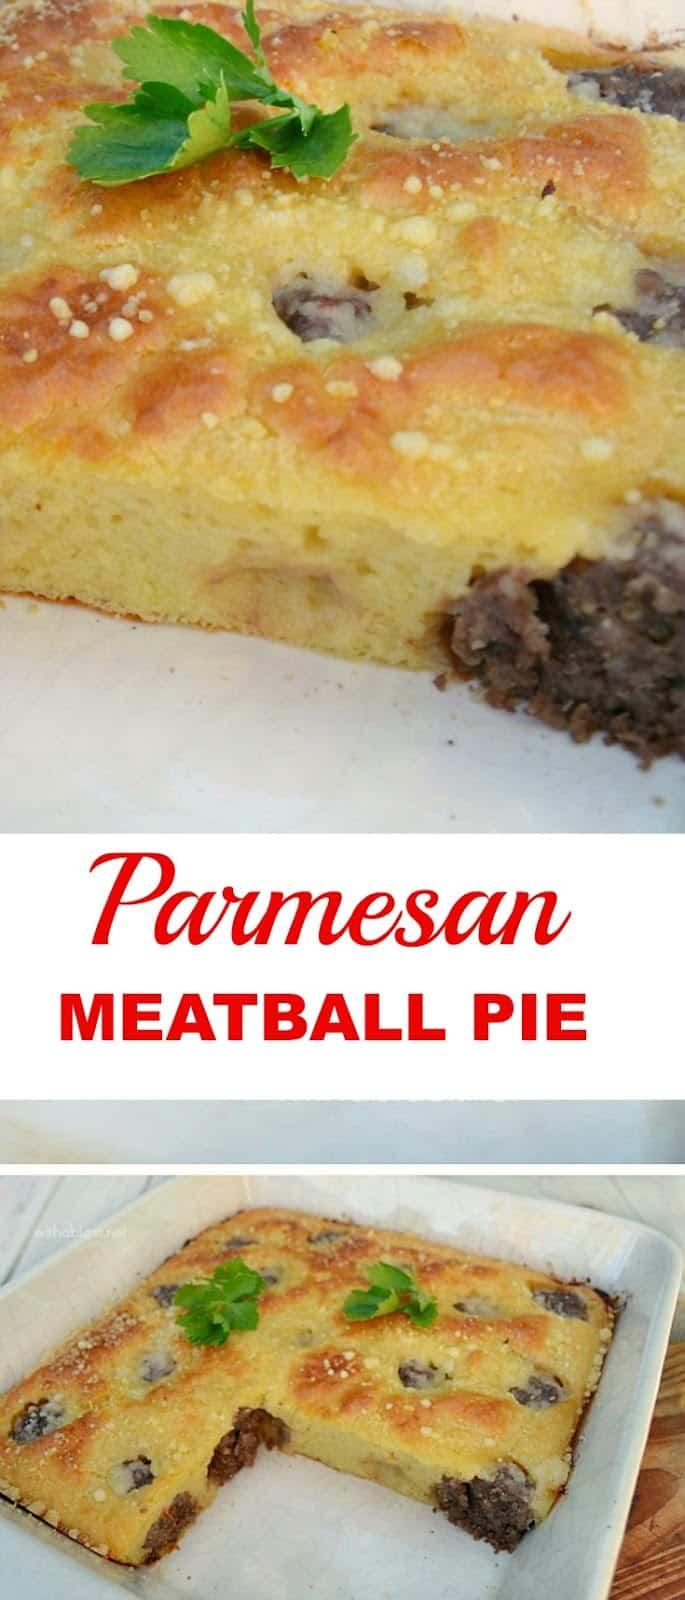 Parmesan Meatball Pie